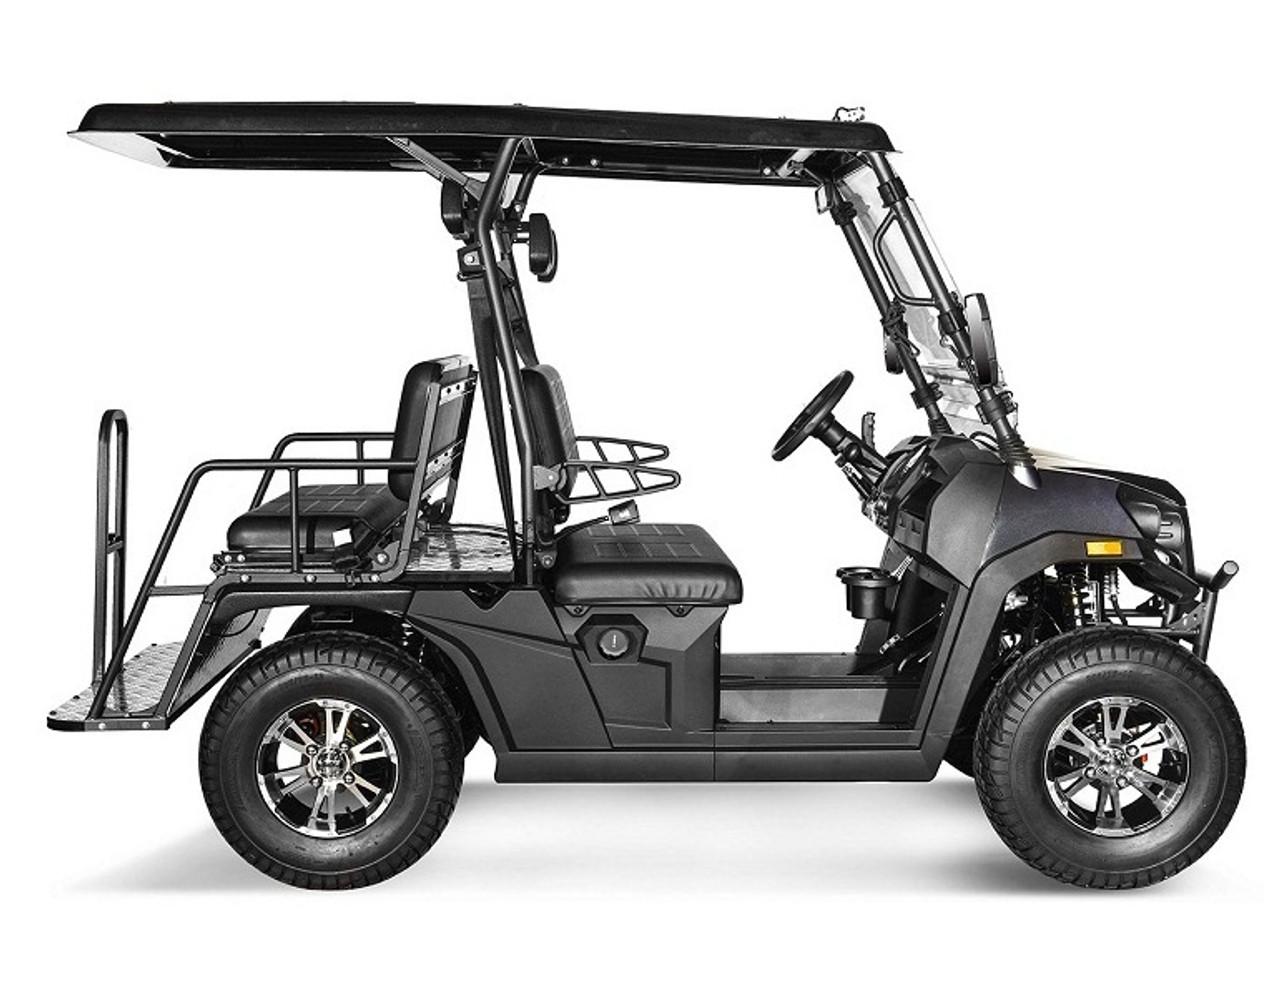 Yes - Vitacci Rover-200 EFI 169cc (Golf Cart) UTV, 4-stroke, Single-cylinder, Oil-cooled